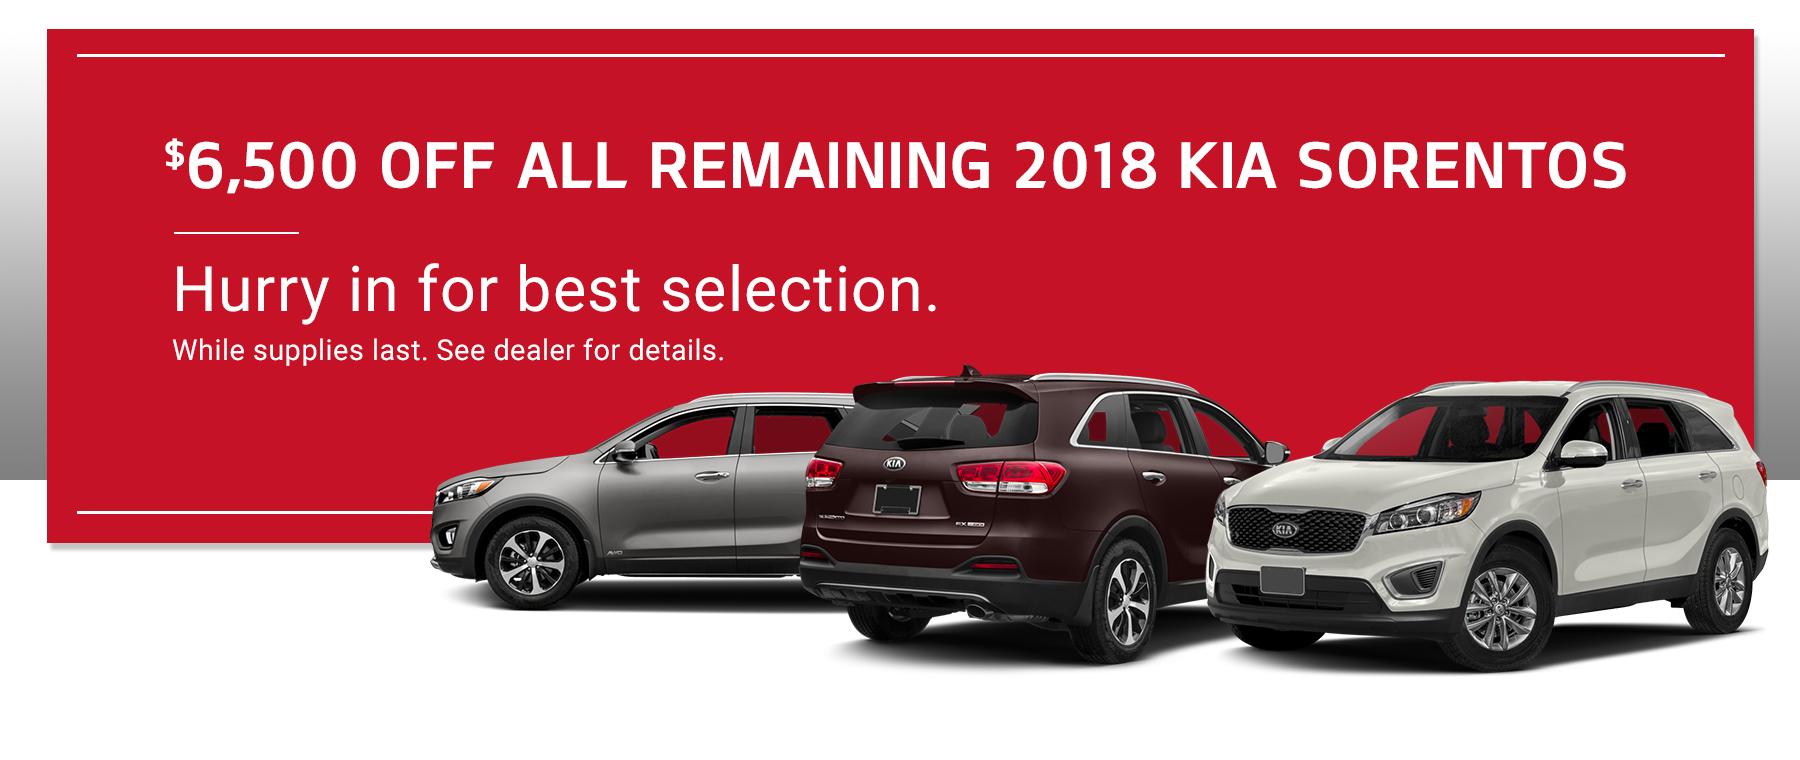 New and Used Kia Dealer With Service Center in Cerritos, CA | Kia ...